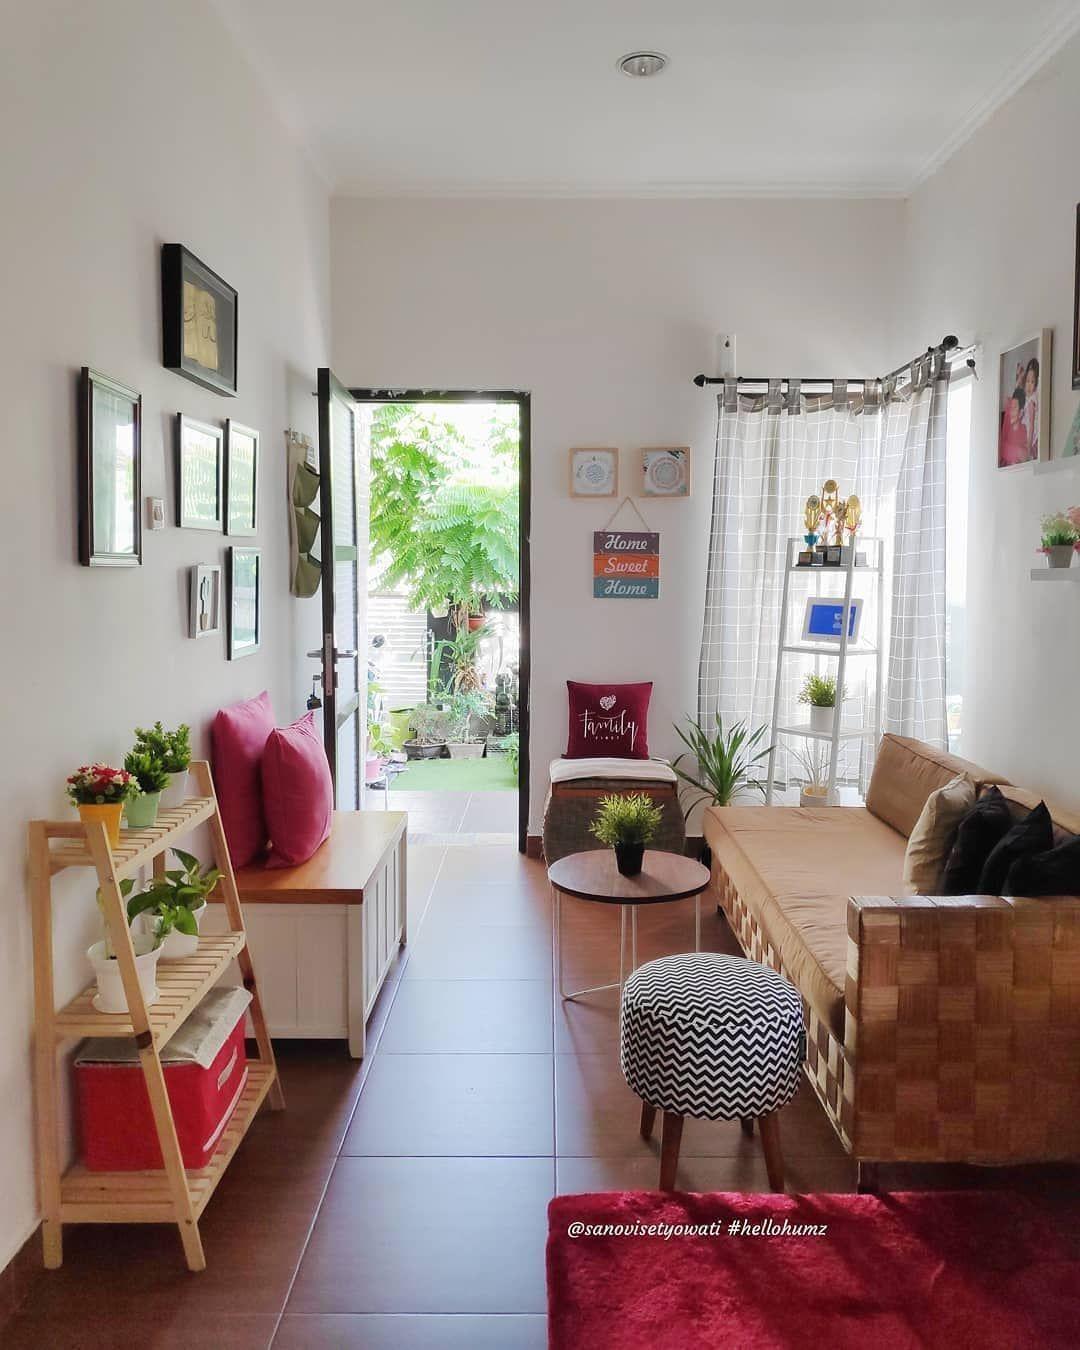 Simple Interior Design Ideas For Small Living Room In India - Decoomo